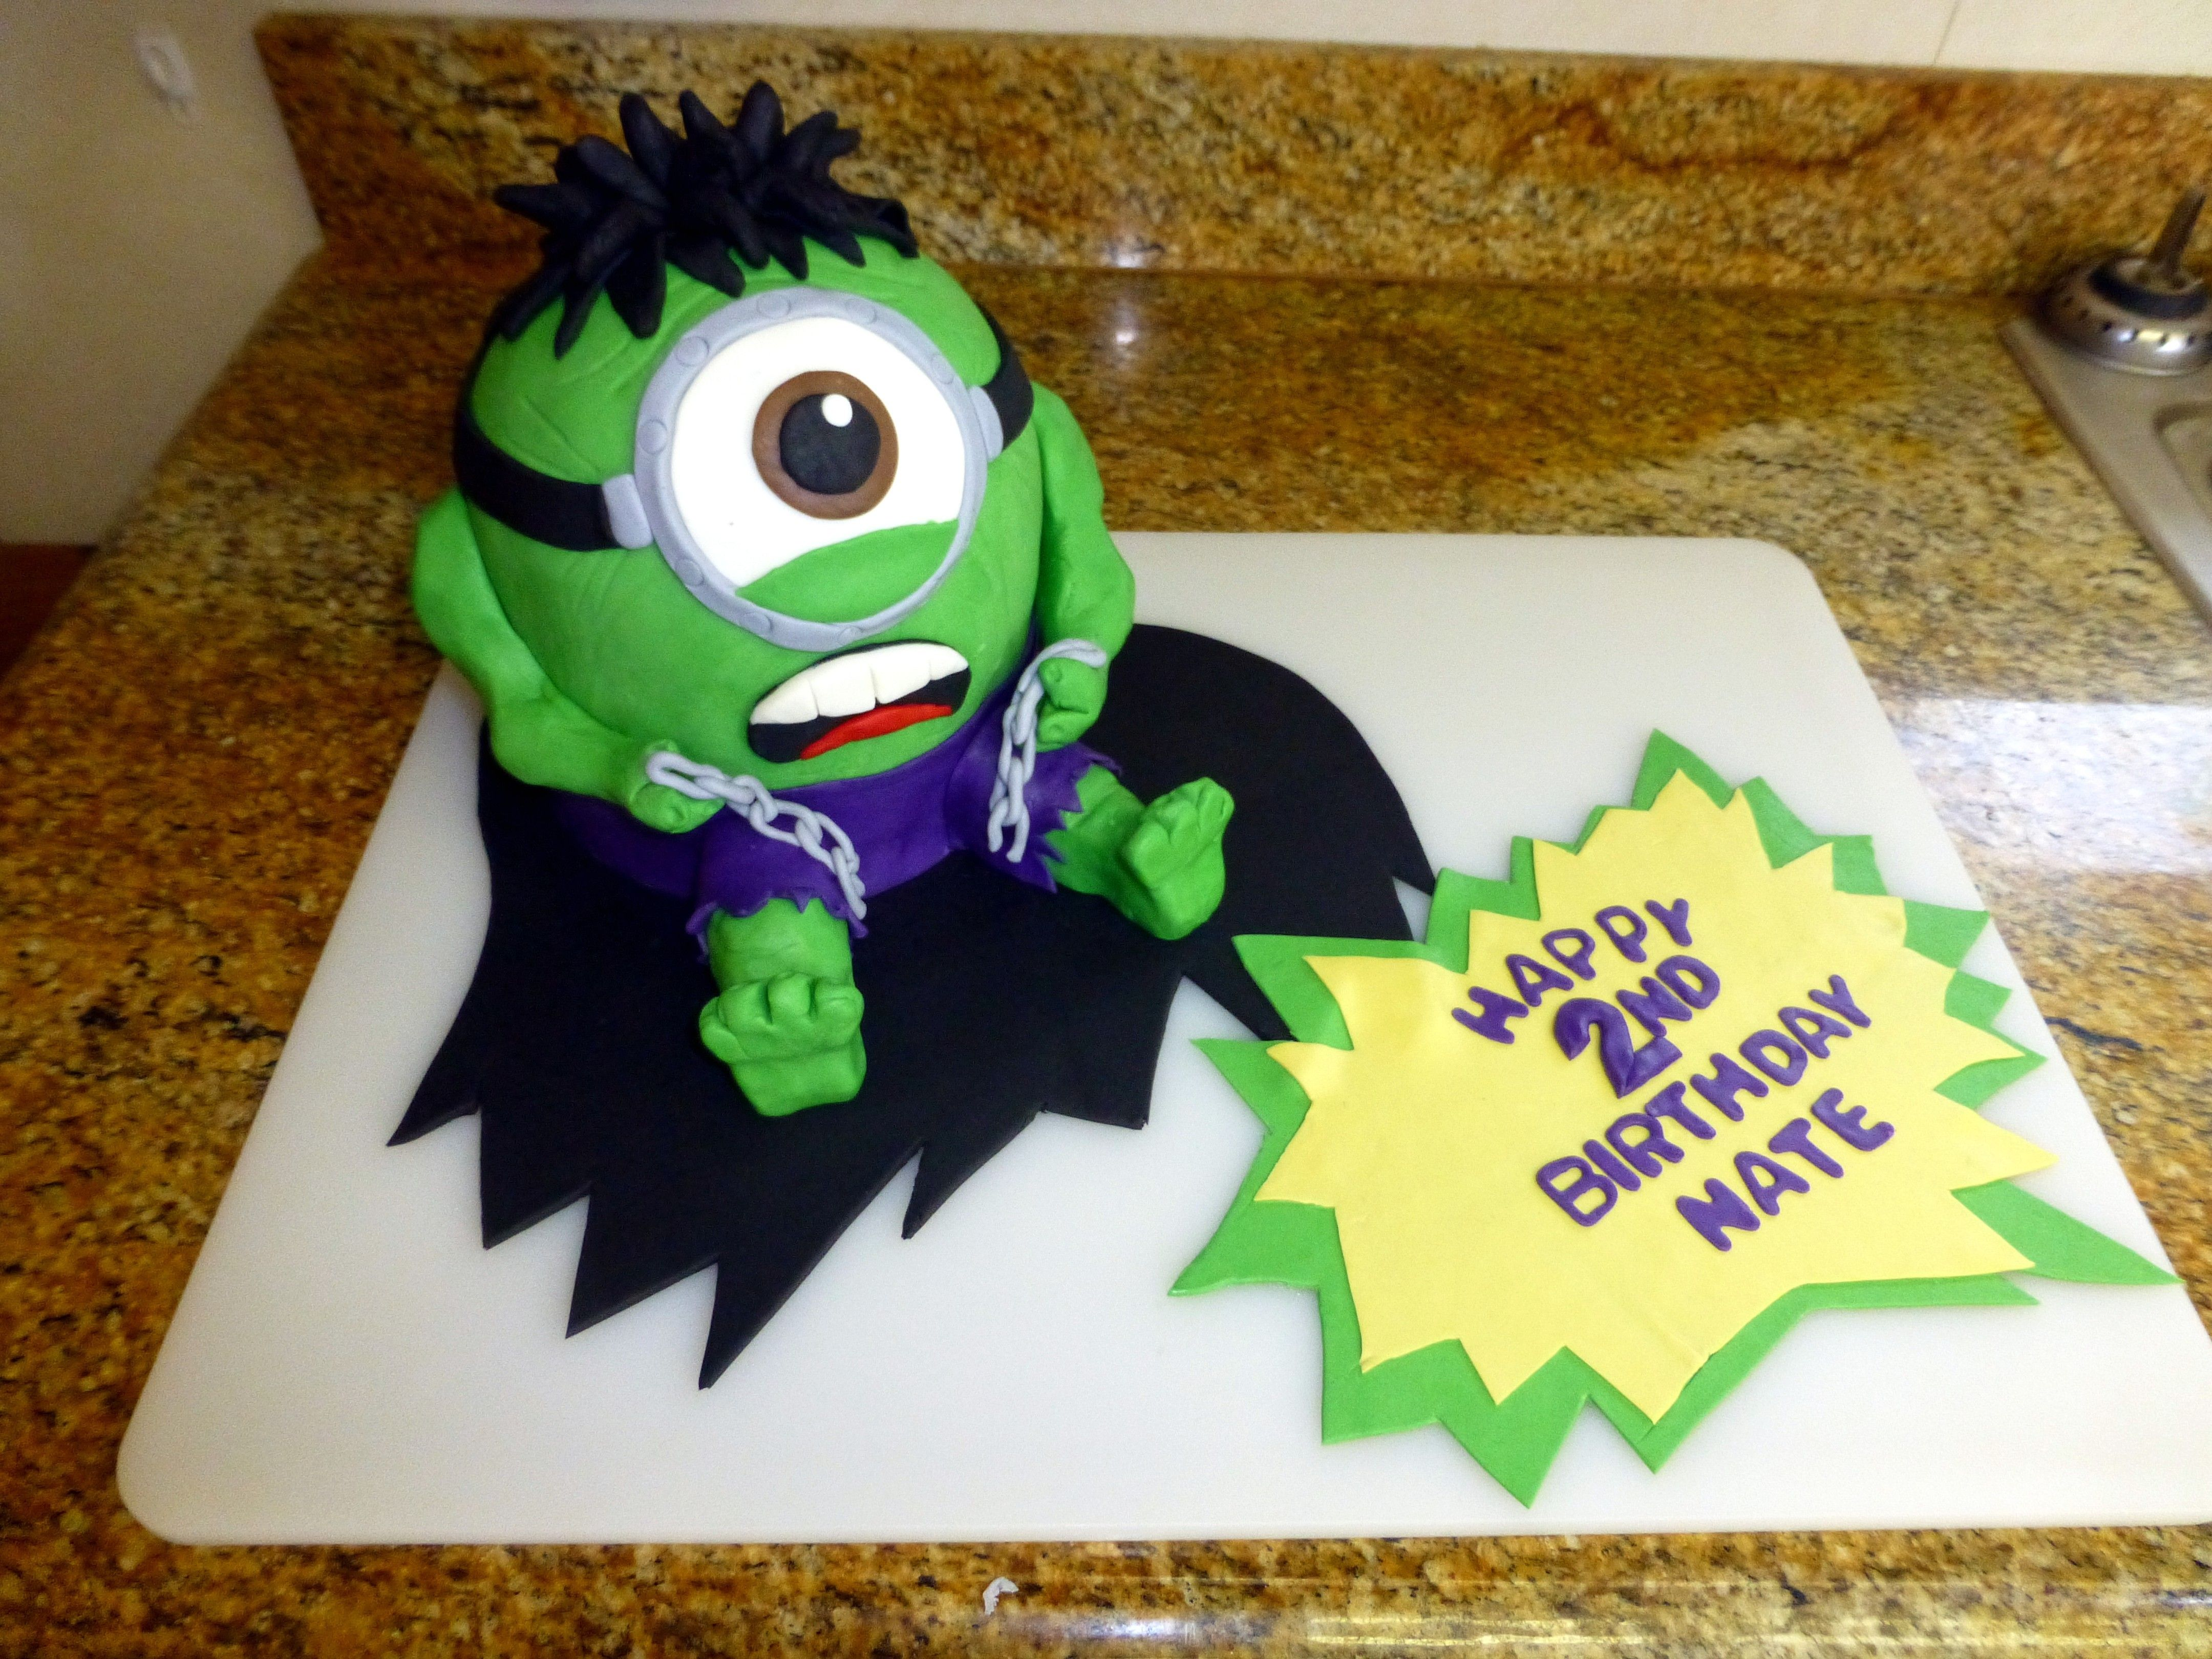 Hulk Minion Cake April 2014 Cakes and Goodies Ive Made